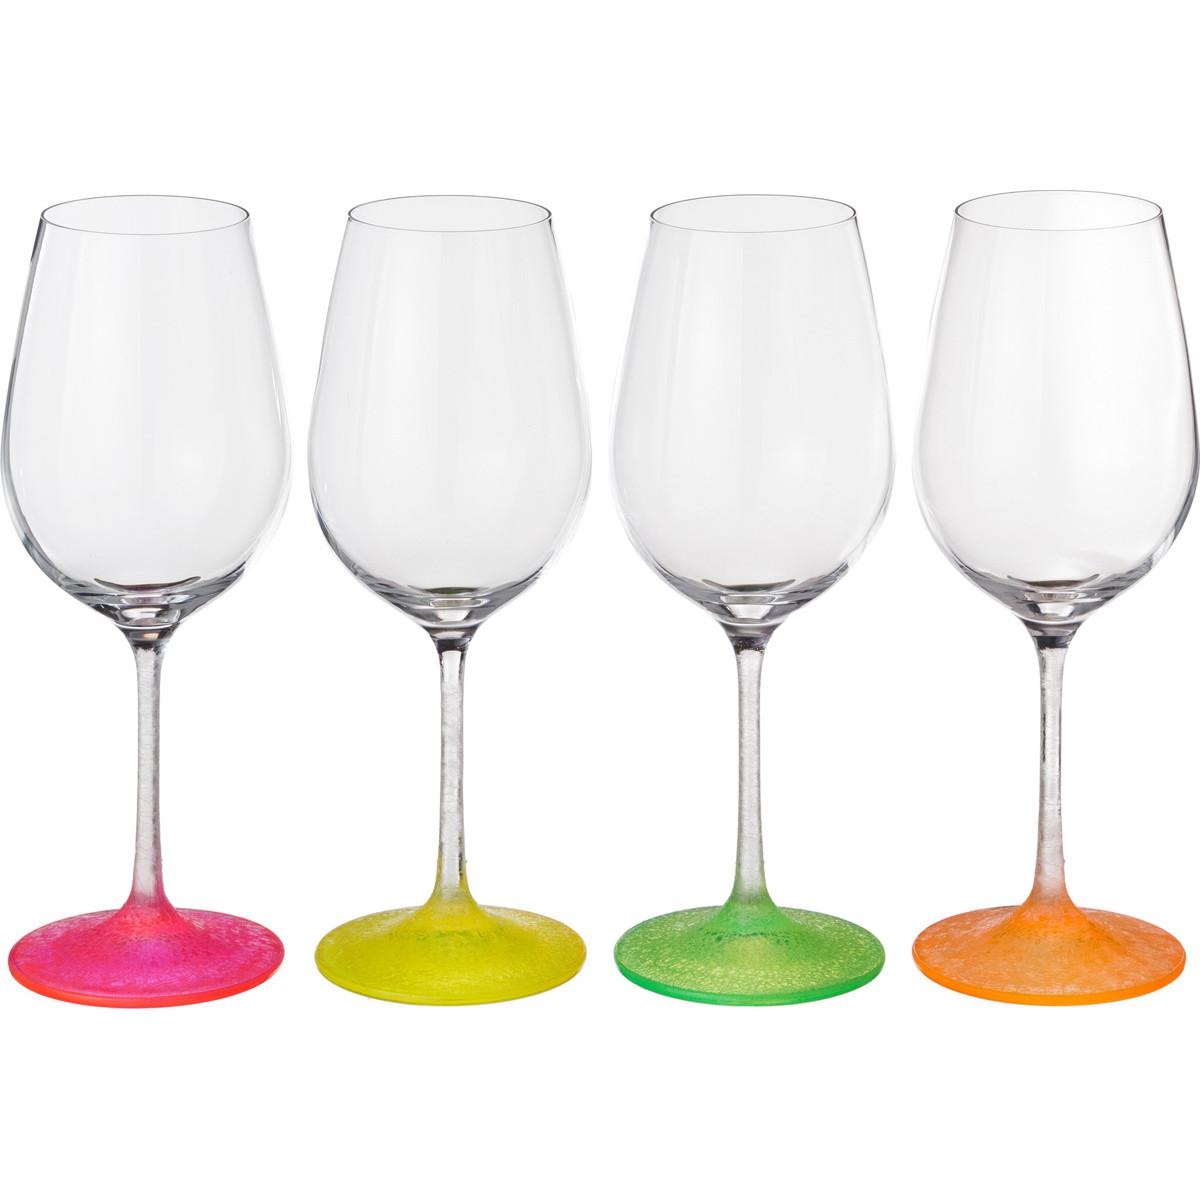 {} Bohemia Crystal Набор бокалов для вина Evonne (23 см - 4 шт) bohemia crystal набор бокалов для шампанского felina 25 см 2 шт